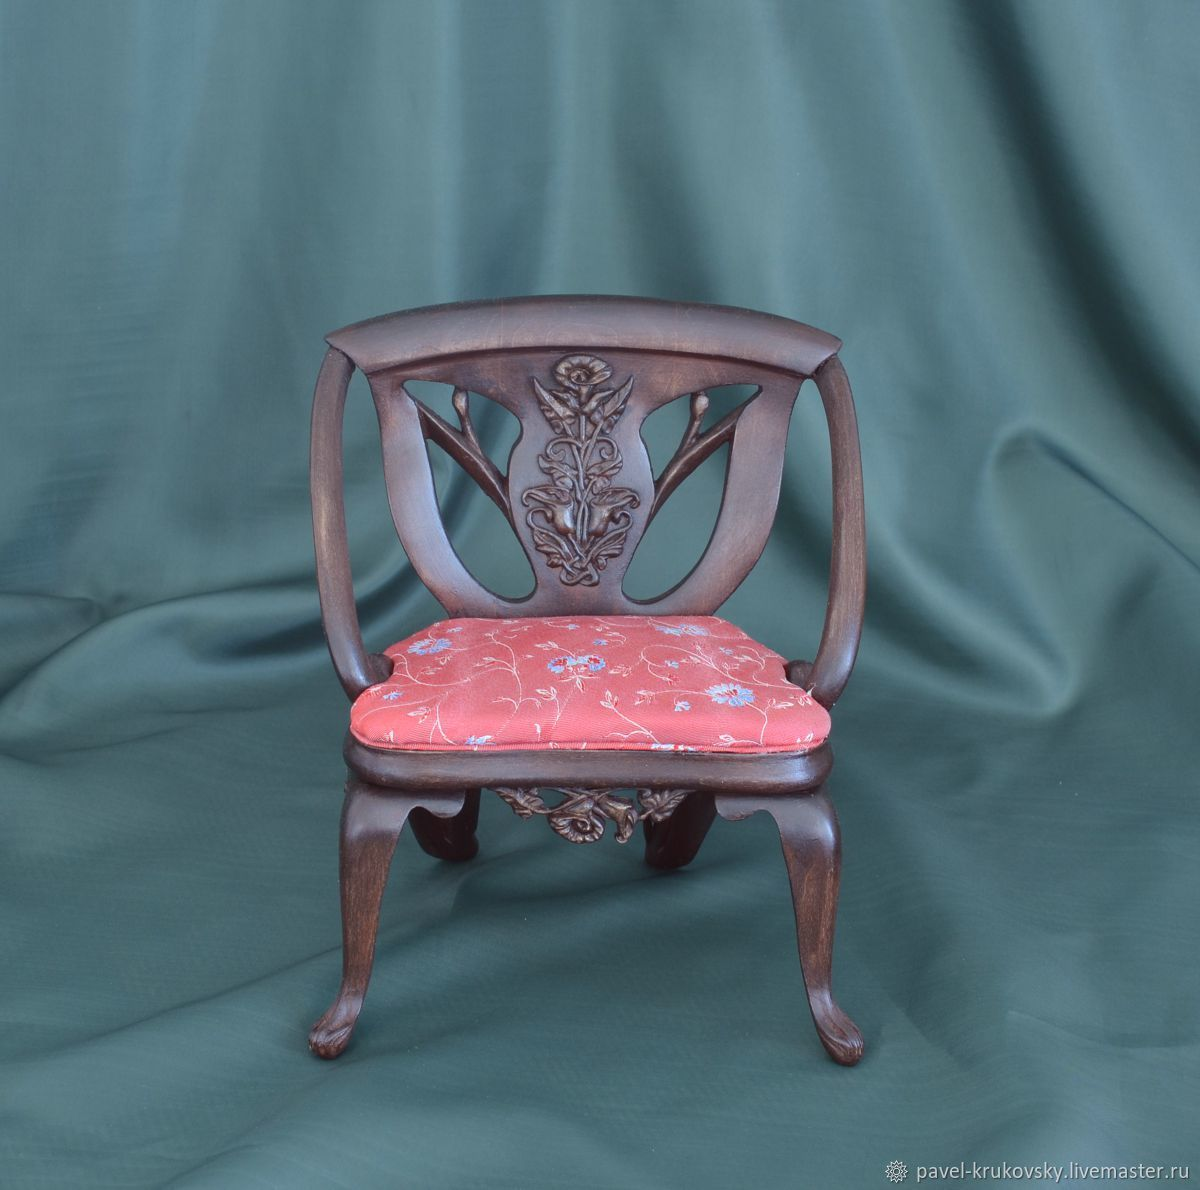 Miniature chair ' Elegia', Dolls, Vladimir,  Фото №1